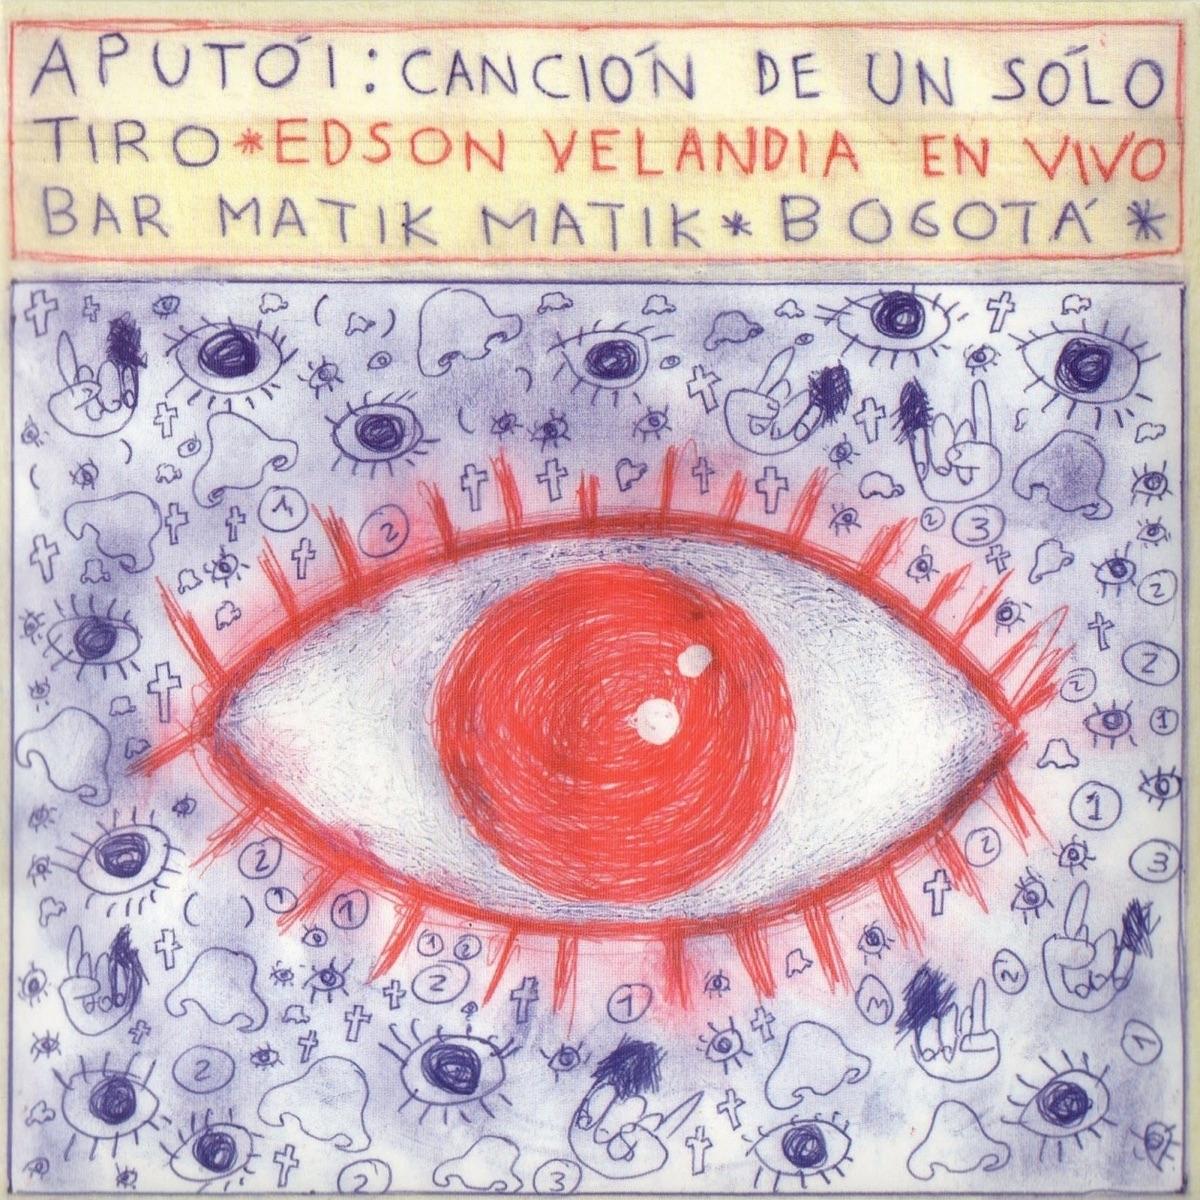 Atupói En Vivo feat Las Áñez Kike Mendoza Ricardo Gallo Santiago Botero  Sebastián Rozo Edson Velandia CD cover